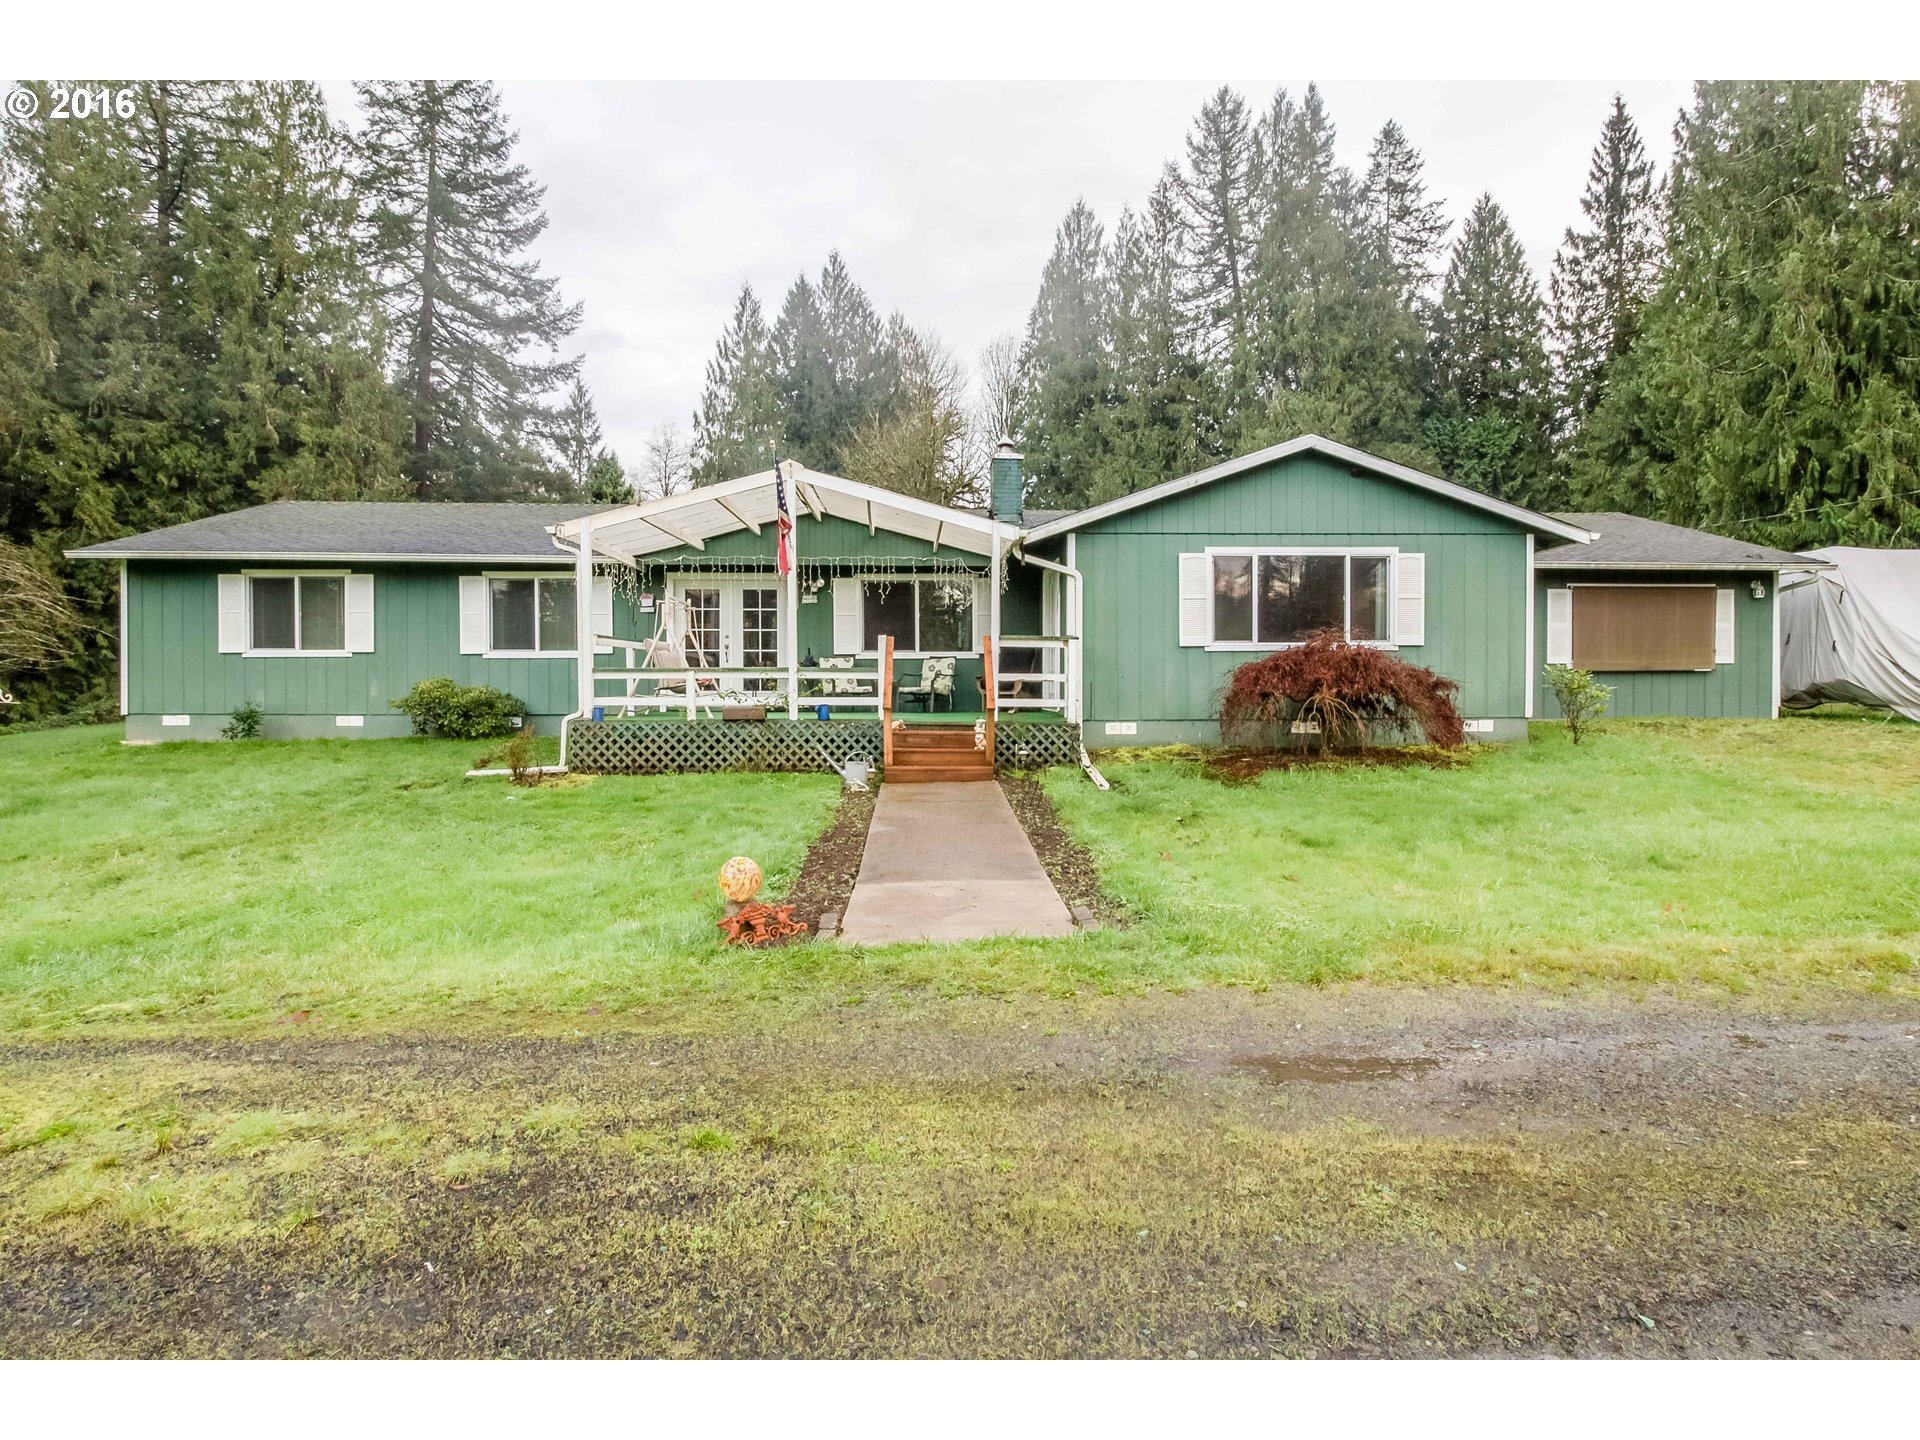 33323 SE SOFICH LN, Eagle Creek OR 97022